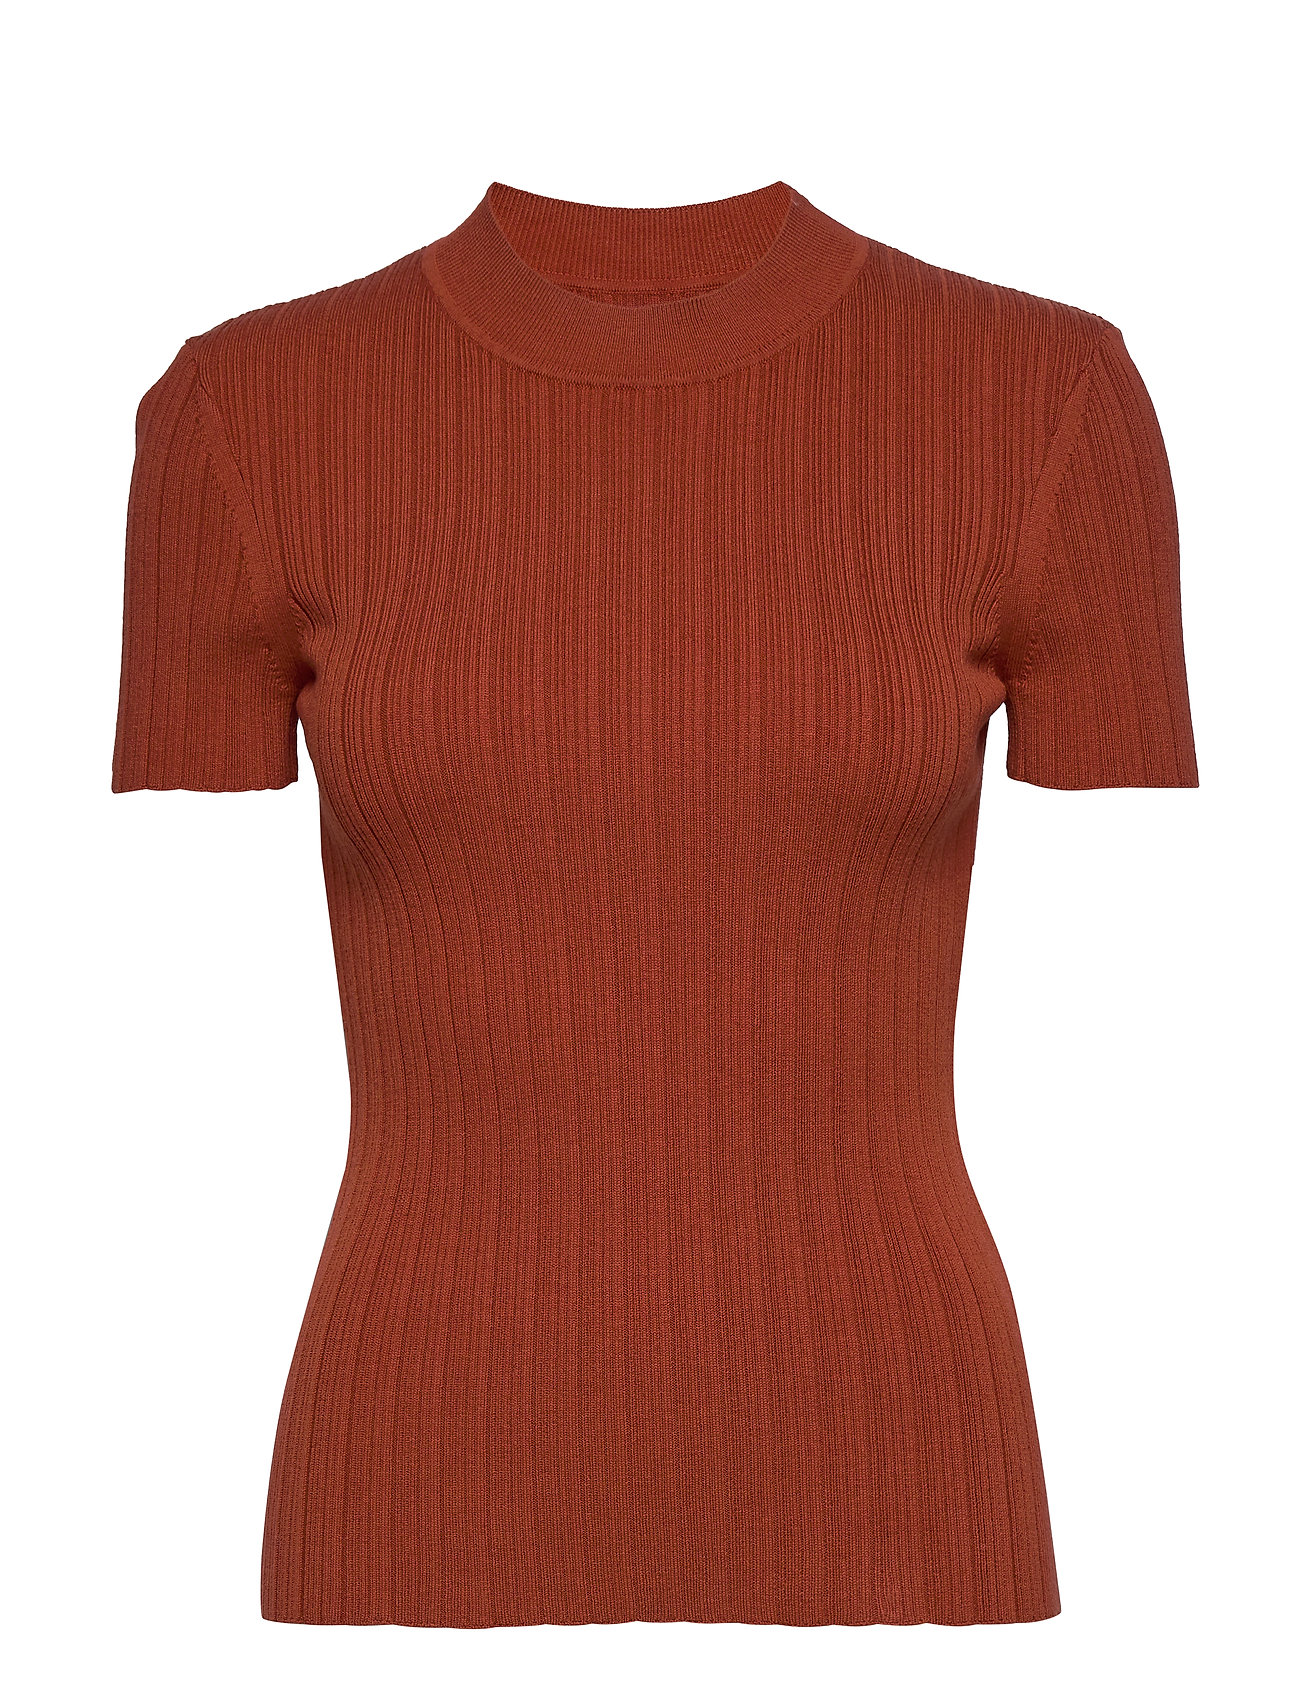 Image of Joan T-Shirt 11559 T-shirt Top Orange Samsøe Samsøe (3413103523)